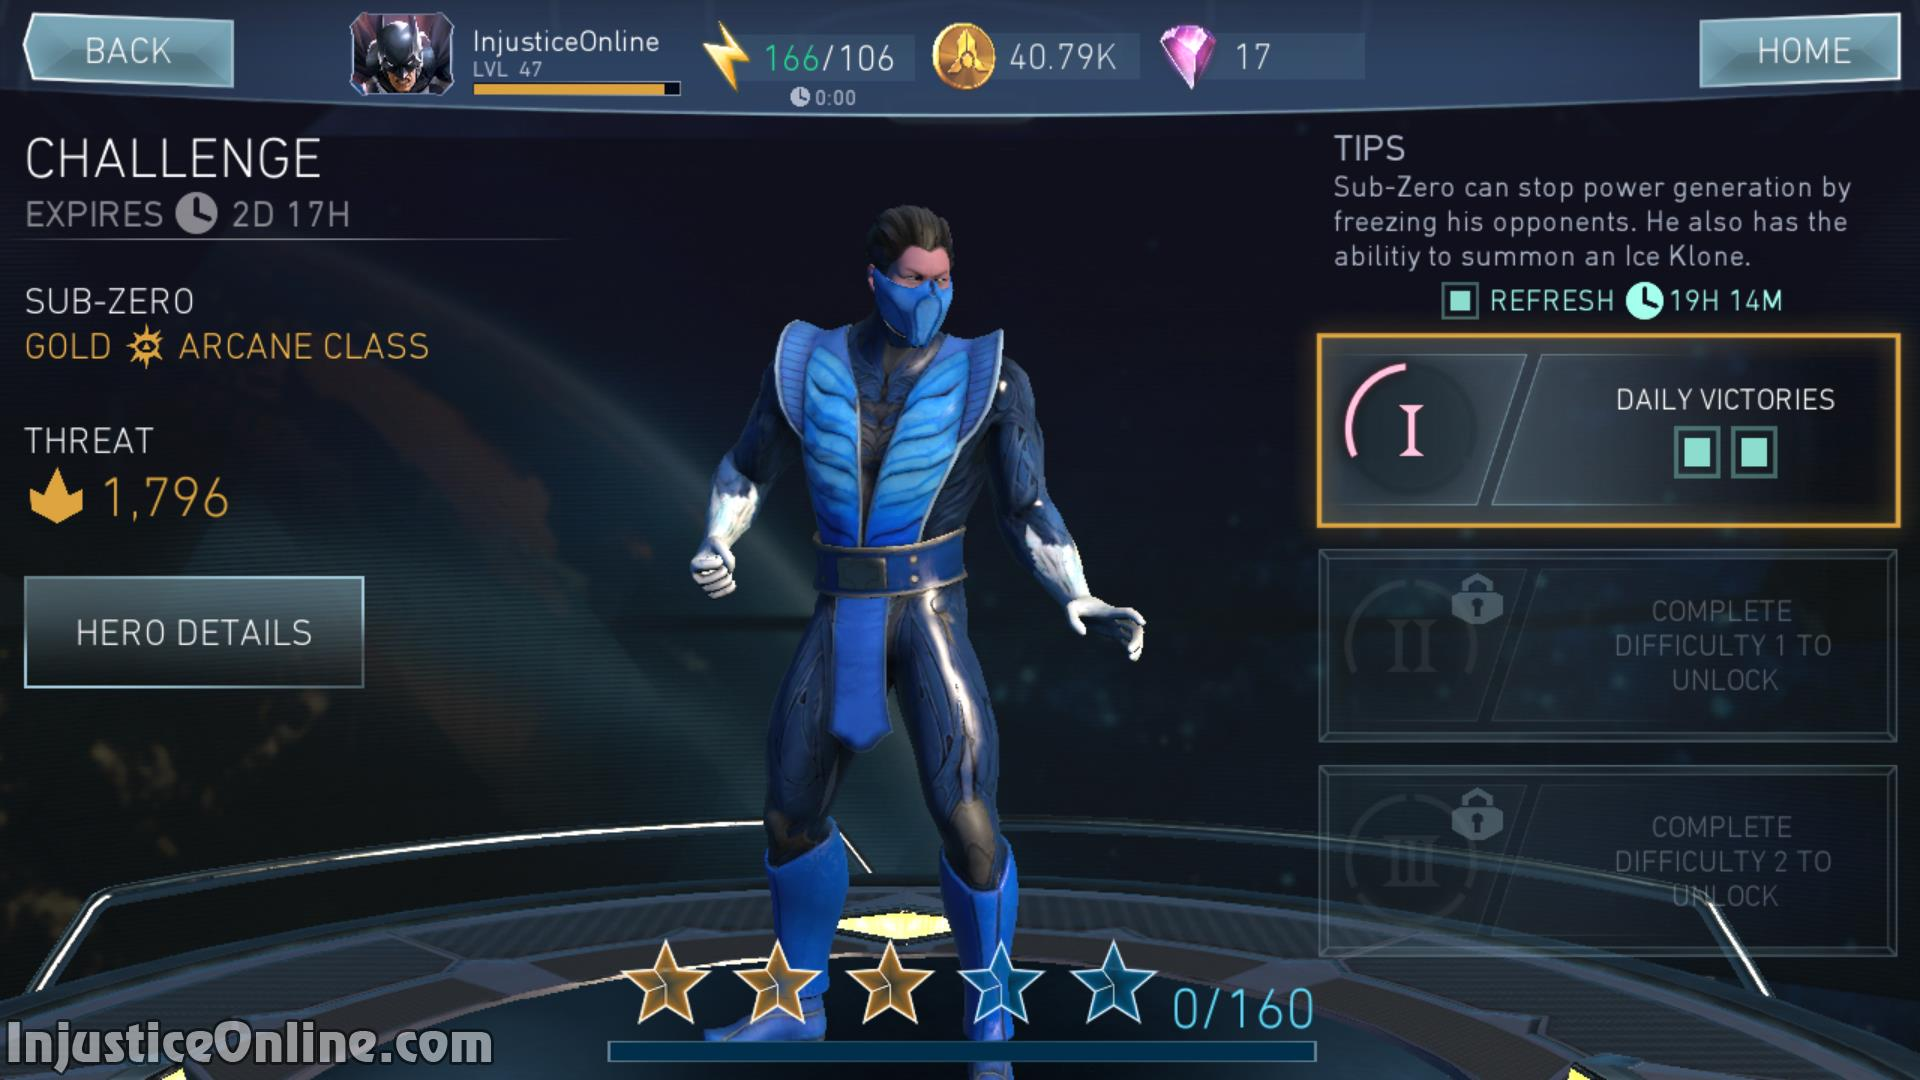 Injustice 2 Mobile Sub Zero Challenge Screenshot 02 InjusticeOnline